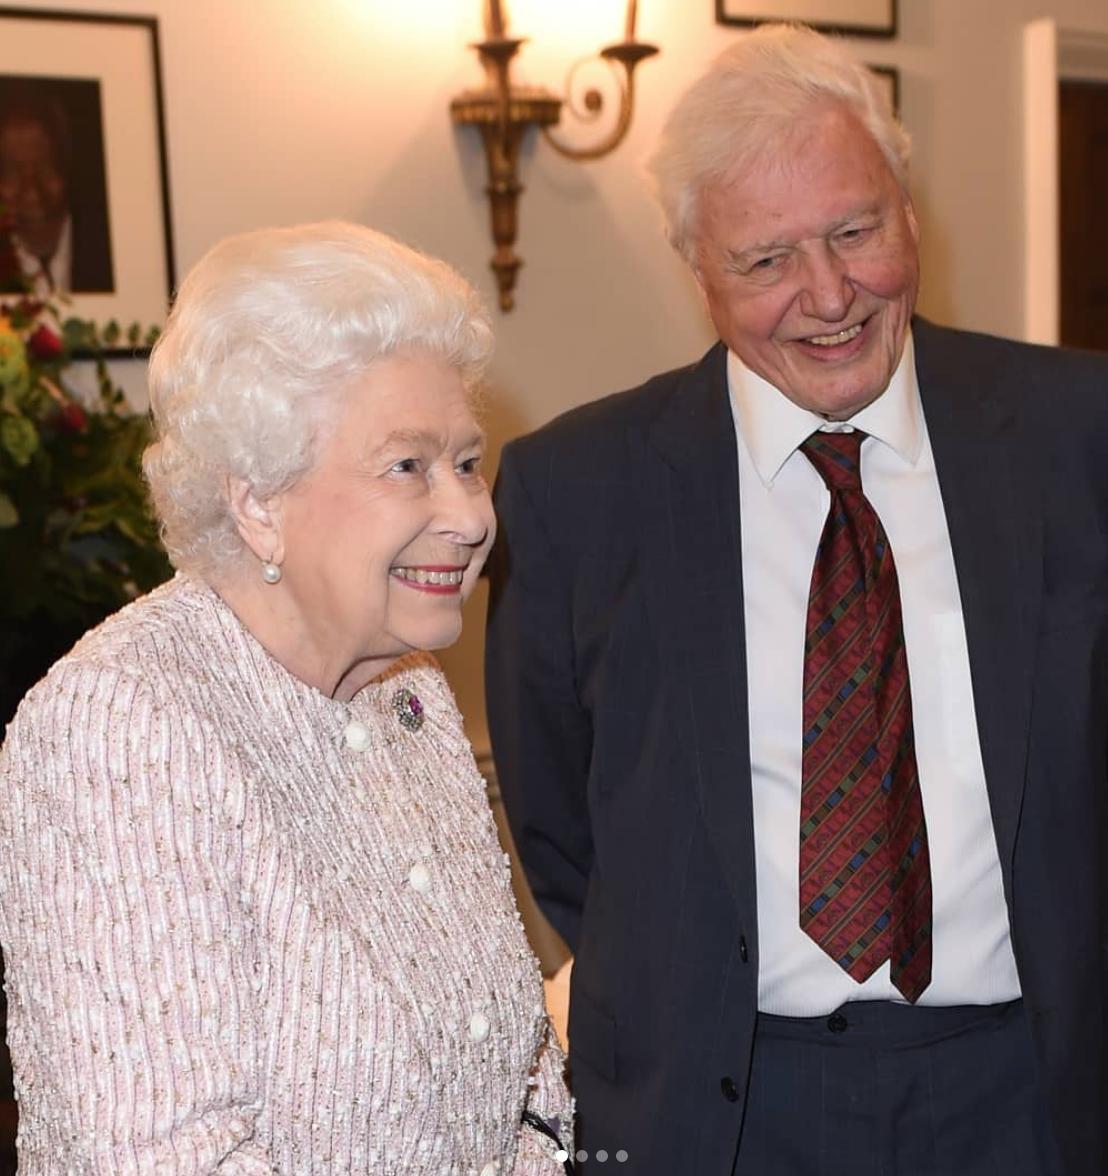 The Queen Sir David Attenborough